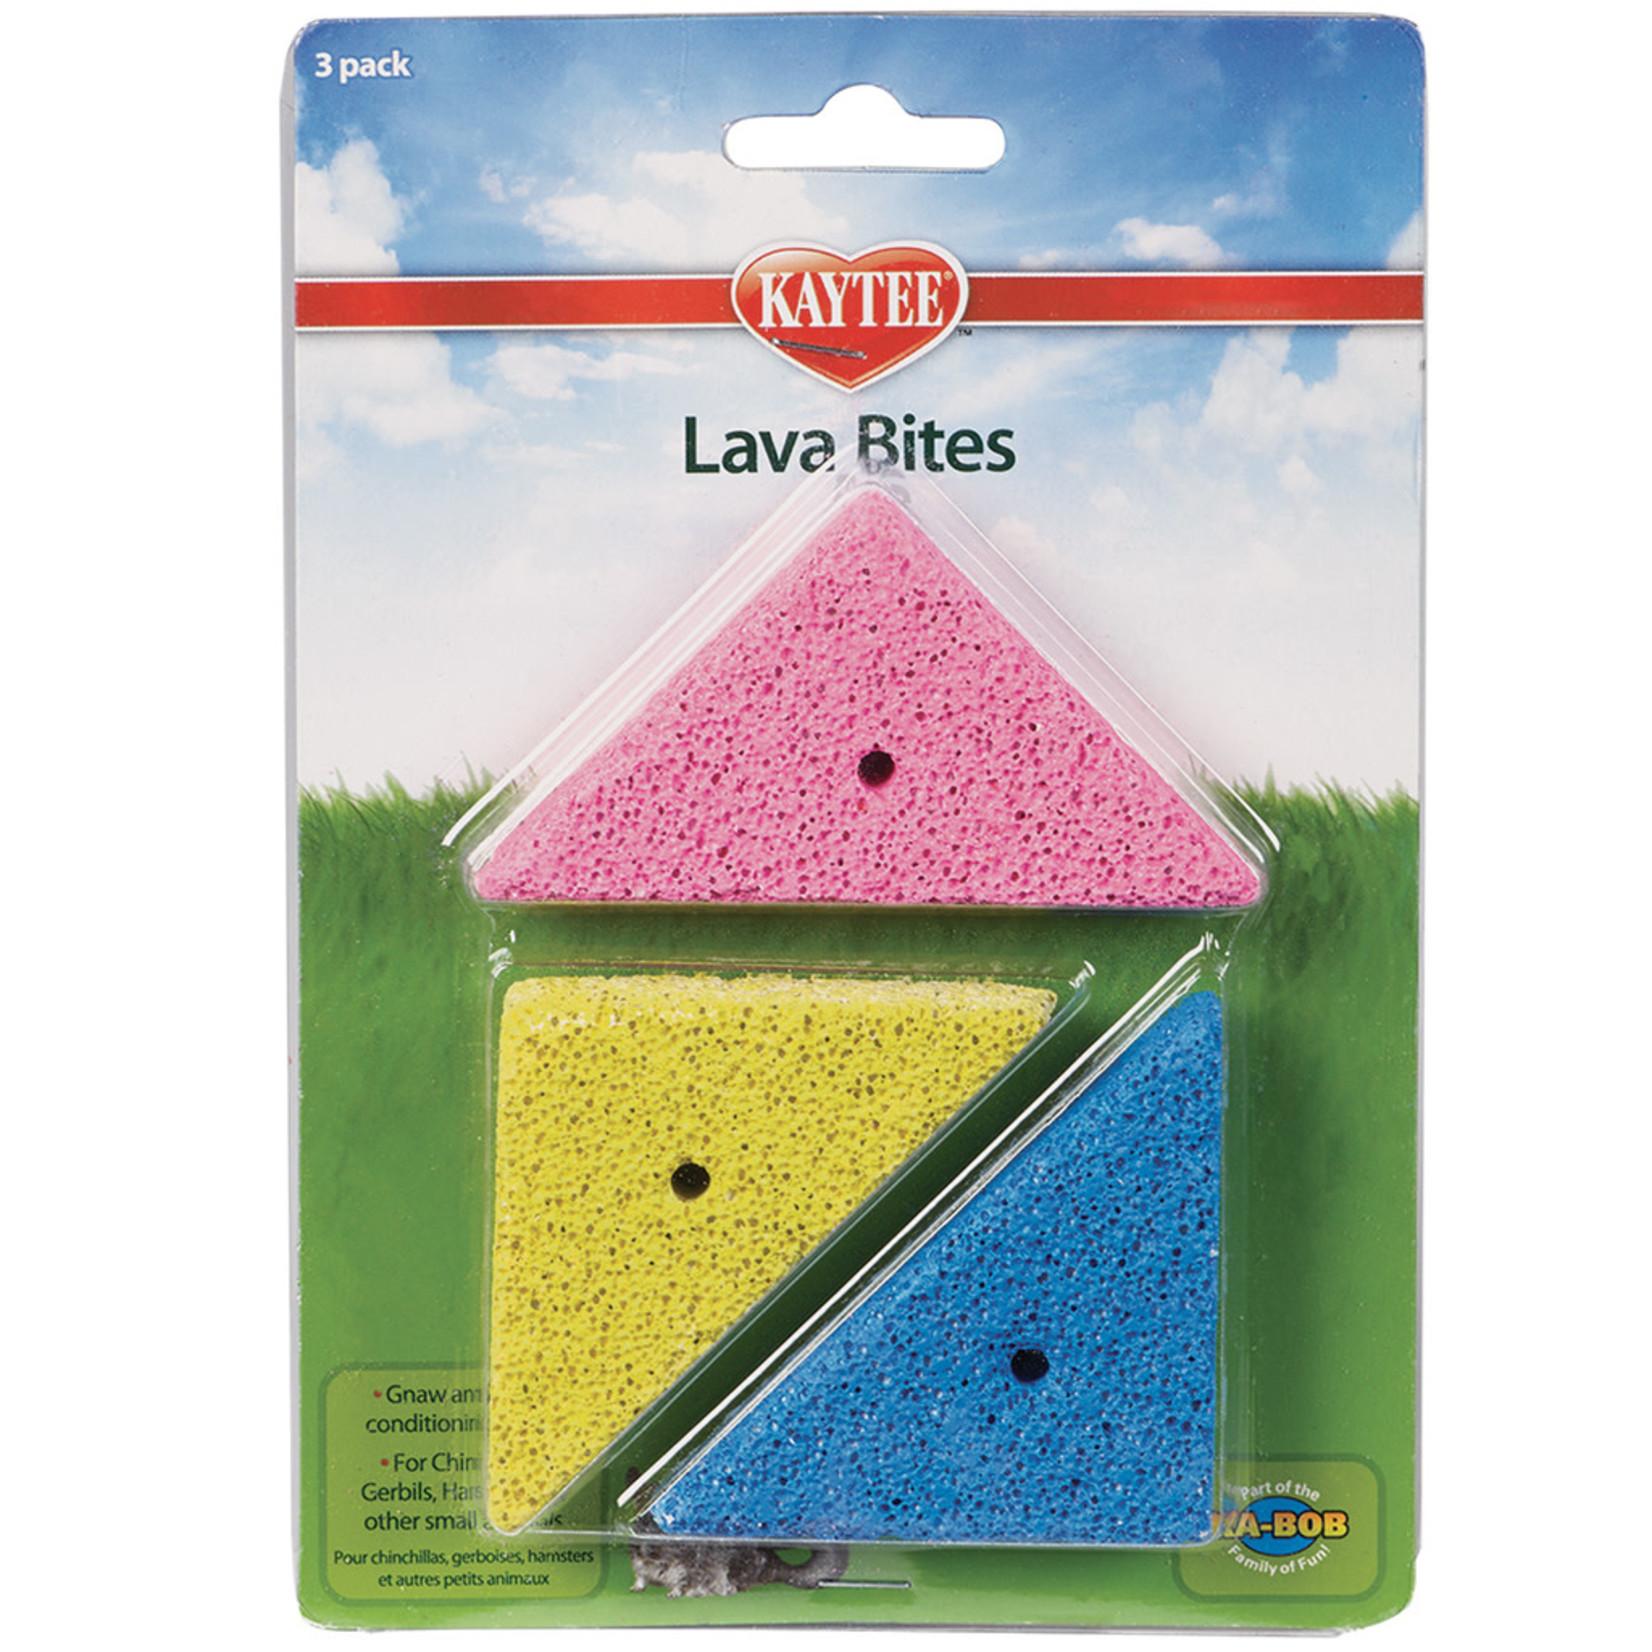 KAYTEE Kaytee Small Pet Lava Nail Trimmer 3PK